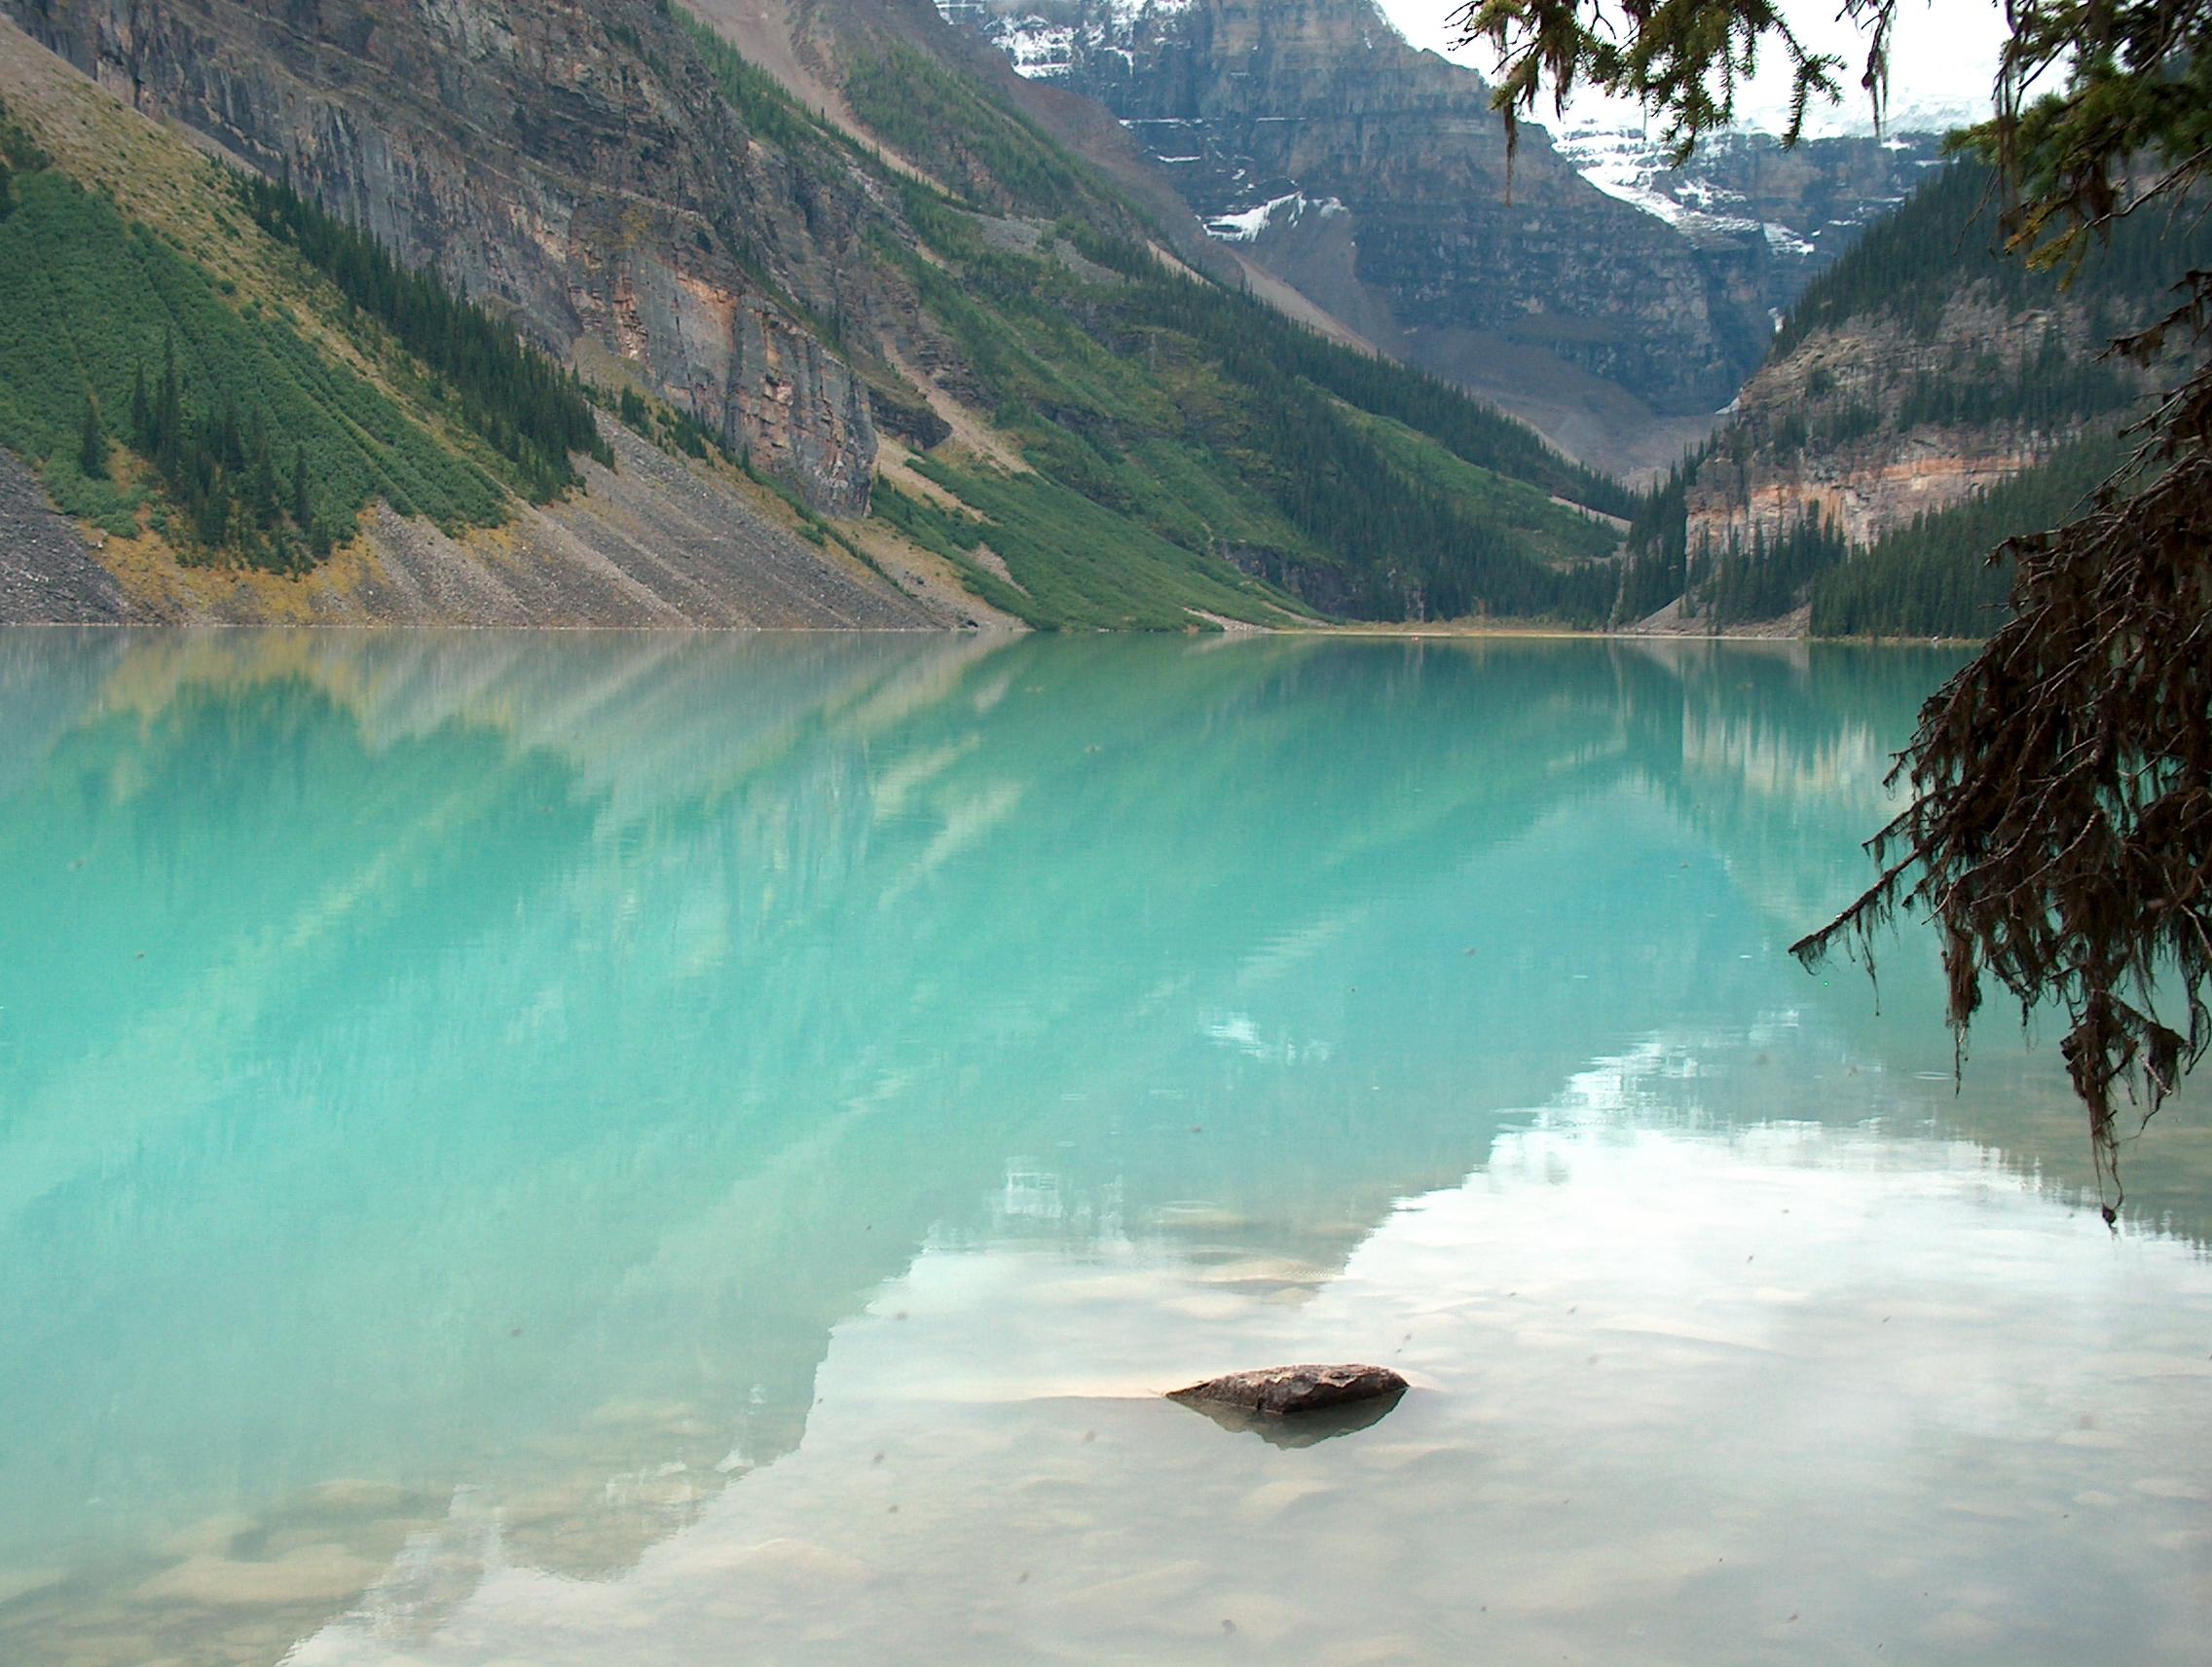 Image of a turqoise lake with mountaneus backdrop